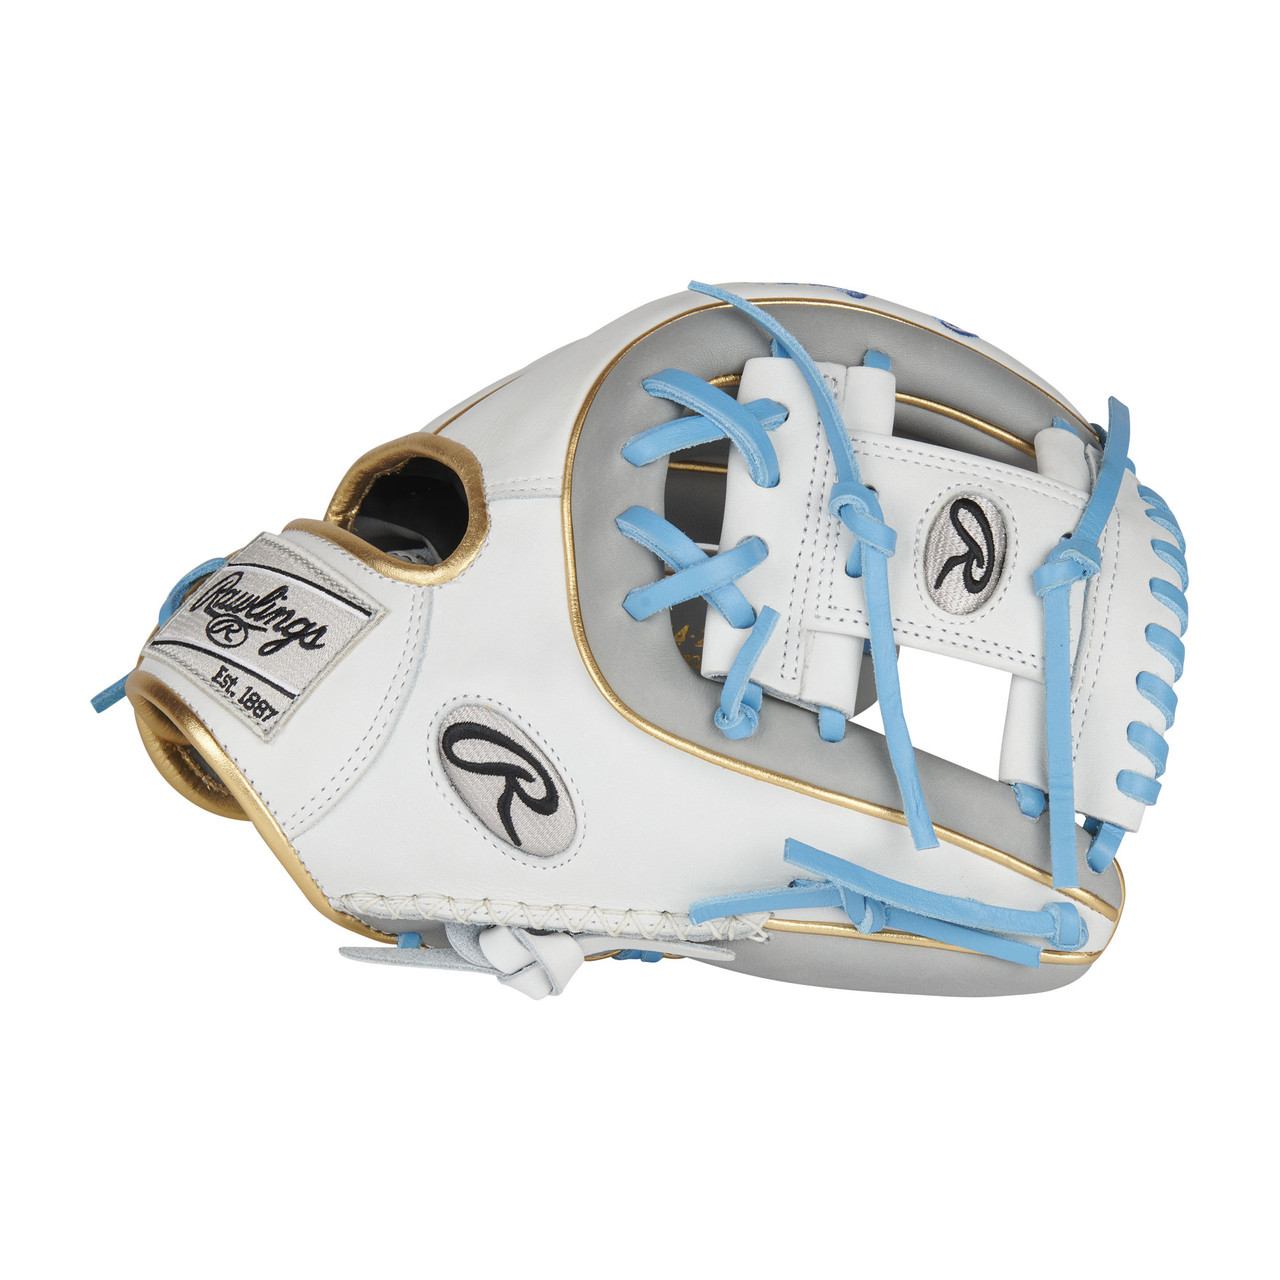 Rawlings Heart of the Hide ColorSync 5.0 11.5 Inch PRO314-2GW Baseball Glove